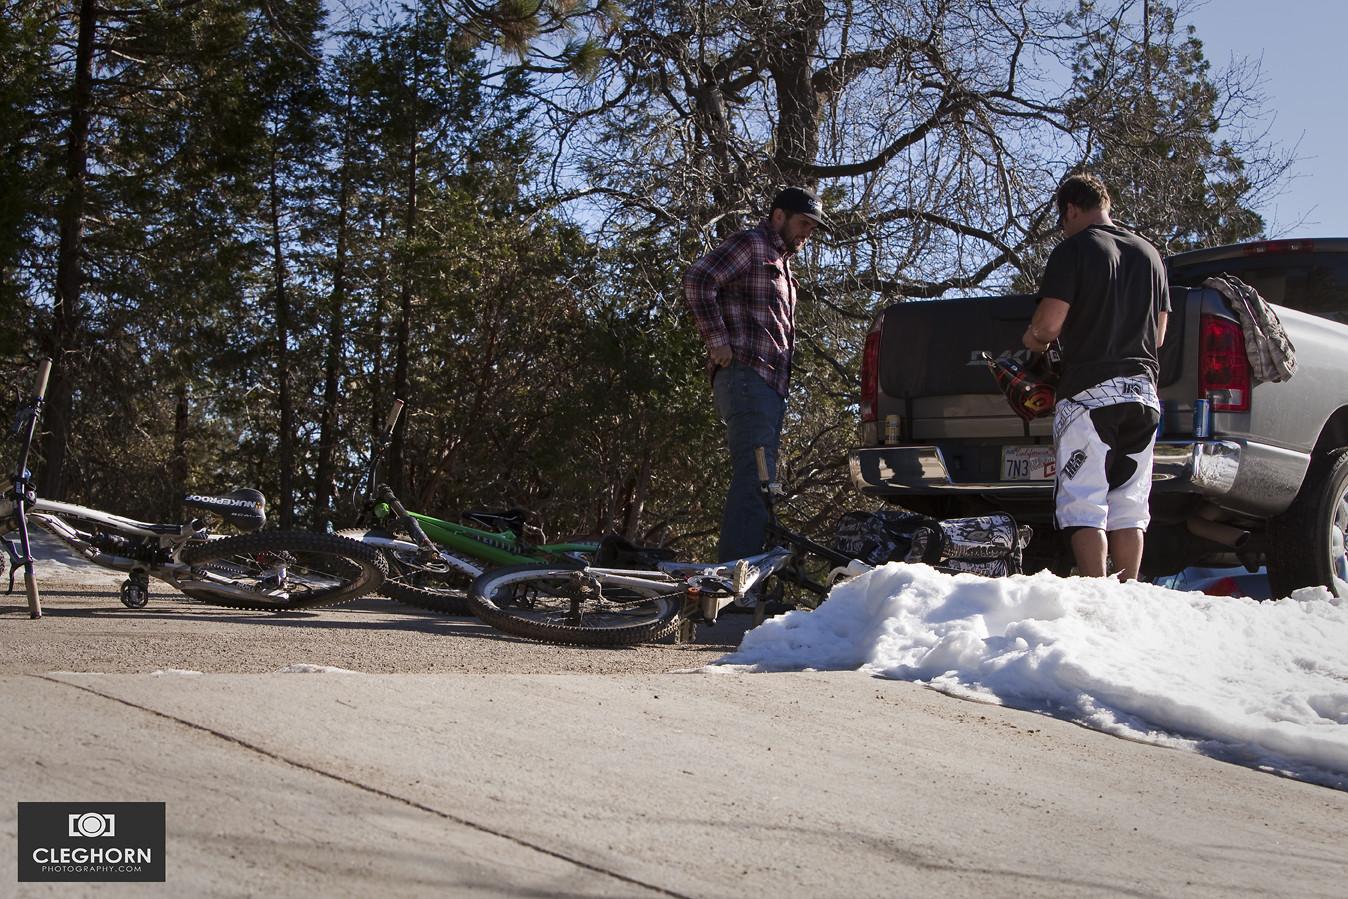 Chris Skudlarski and David Klaassen Van Oorschot - Cleghorn Photography - Mountain Biking Pictures - Vital MTB